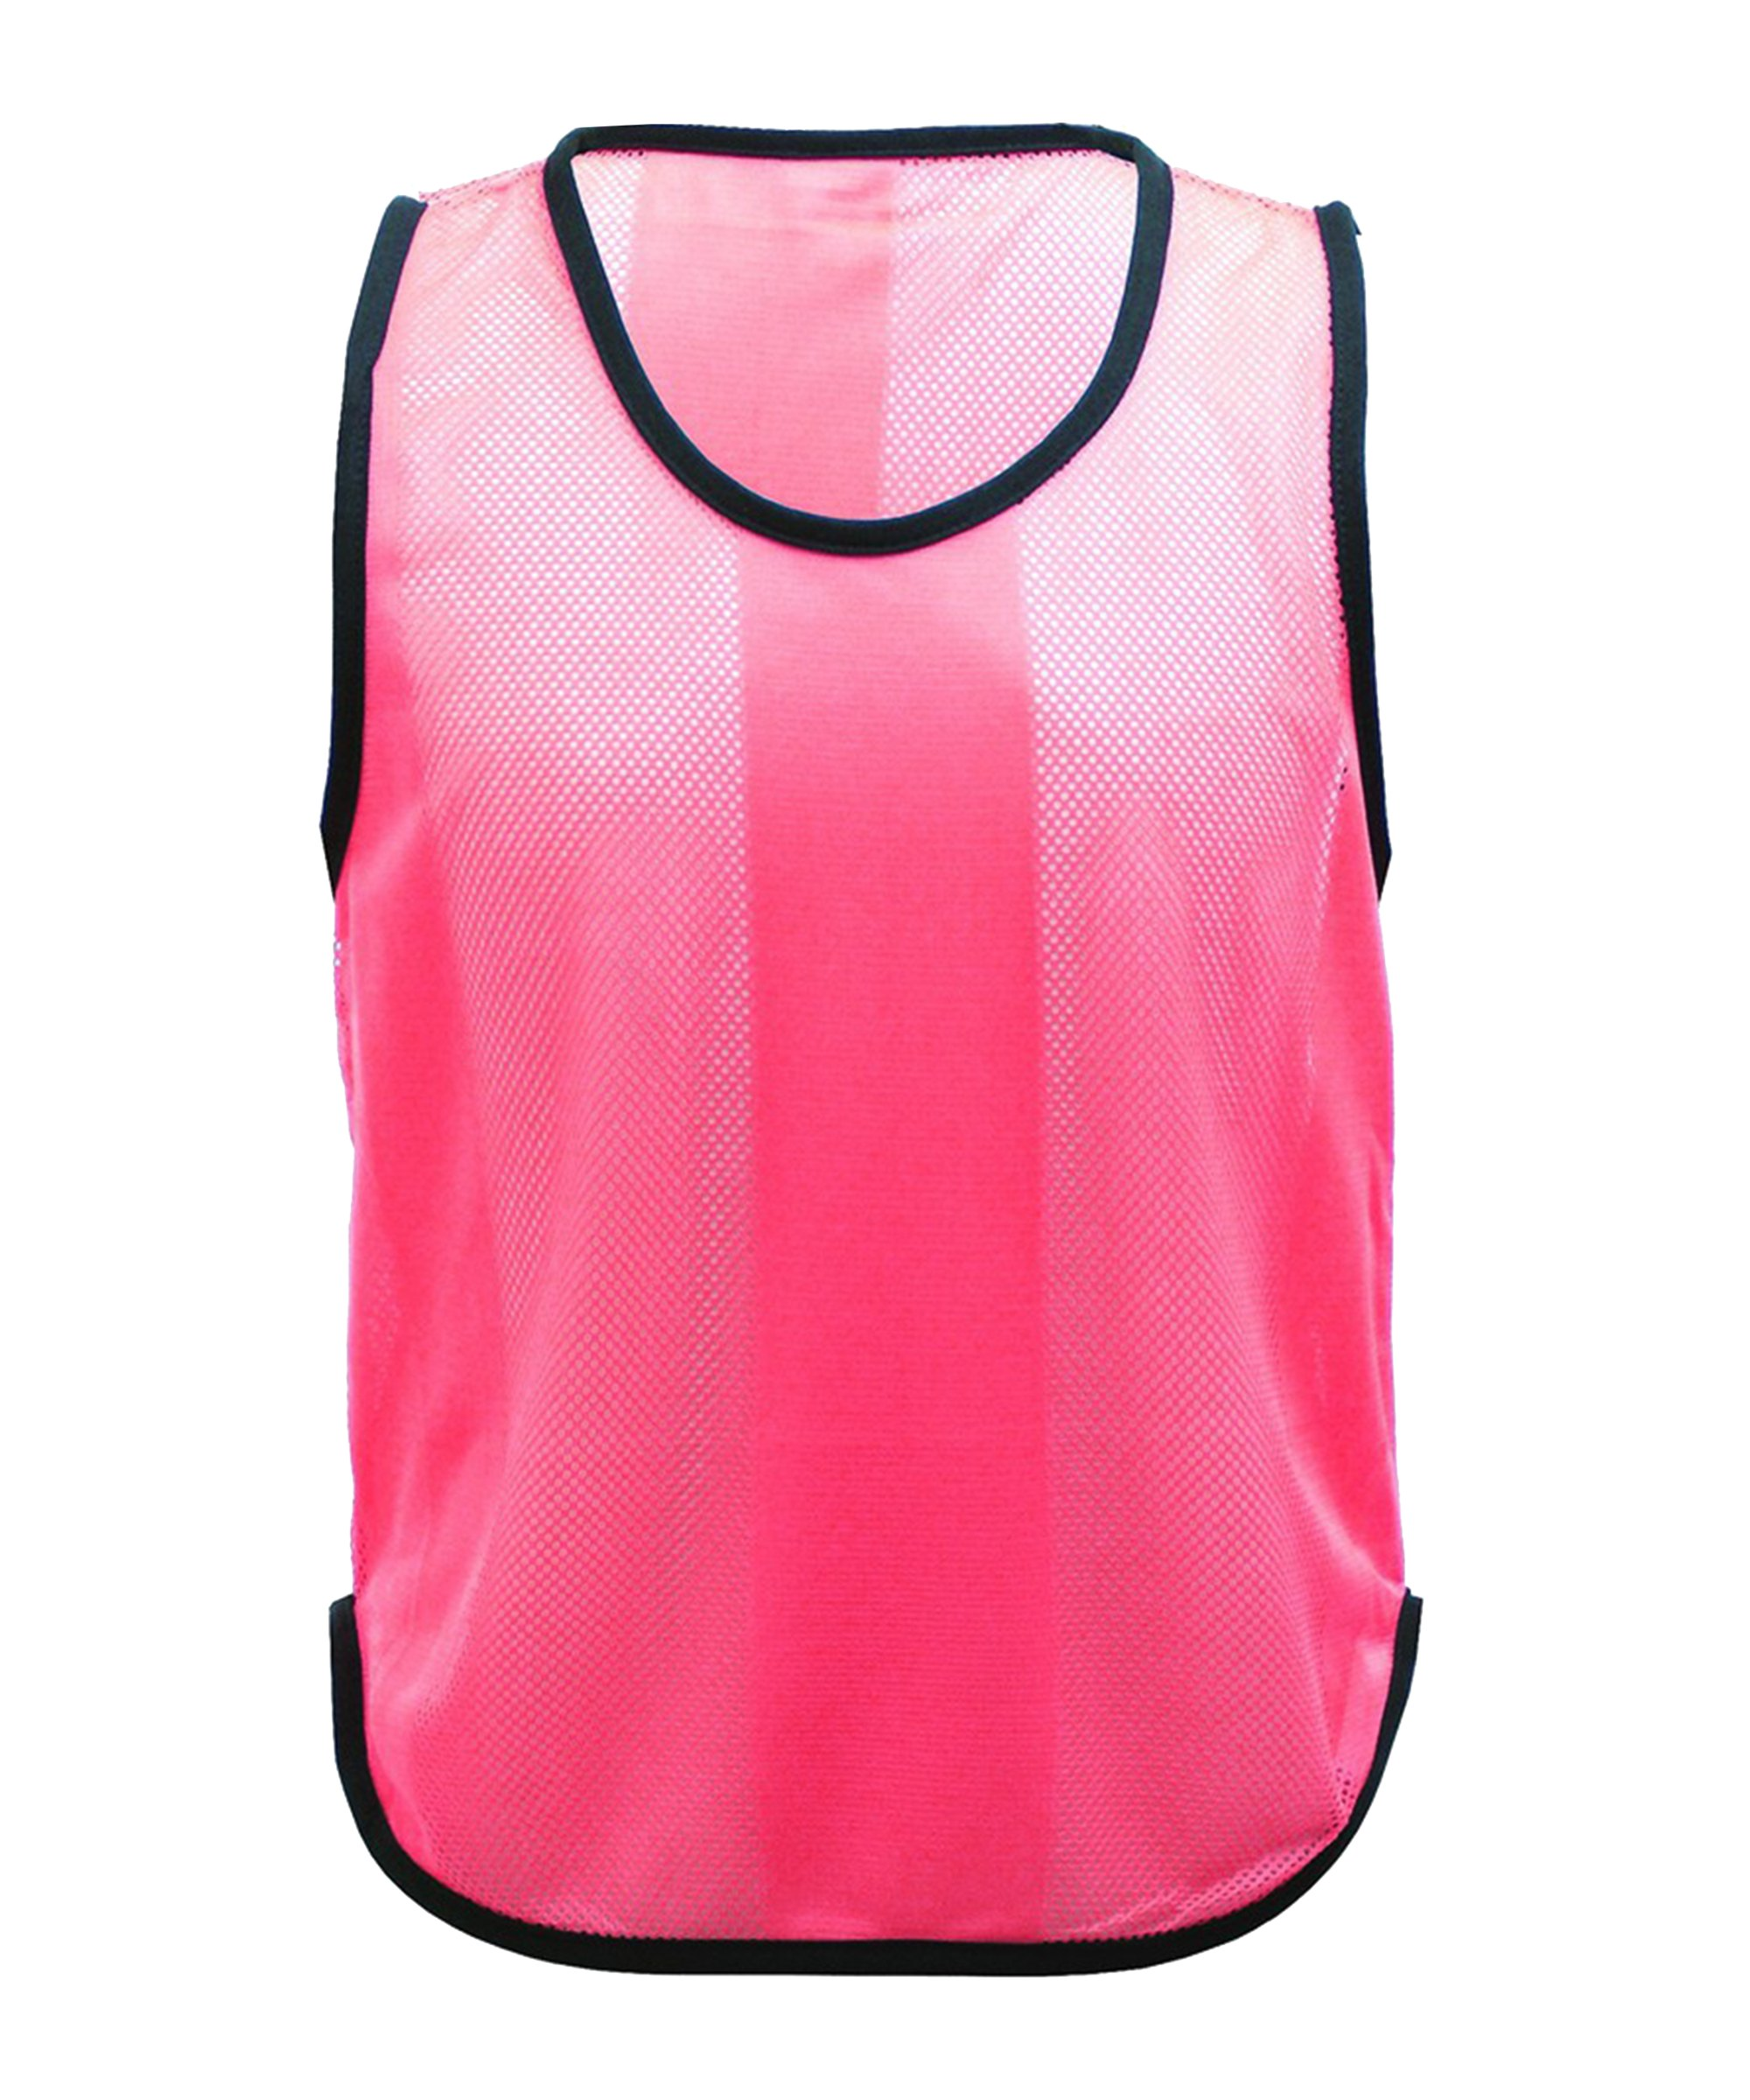 Cawila Trainingsleibchen UNI Mini Pink - pink